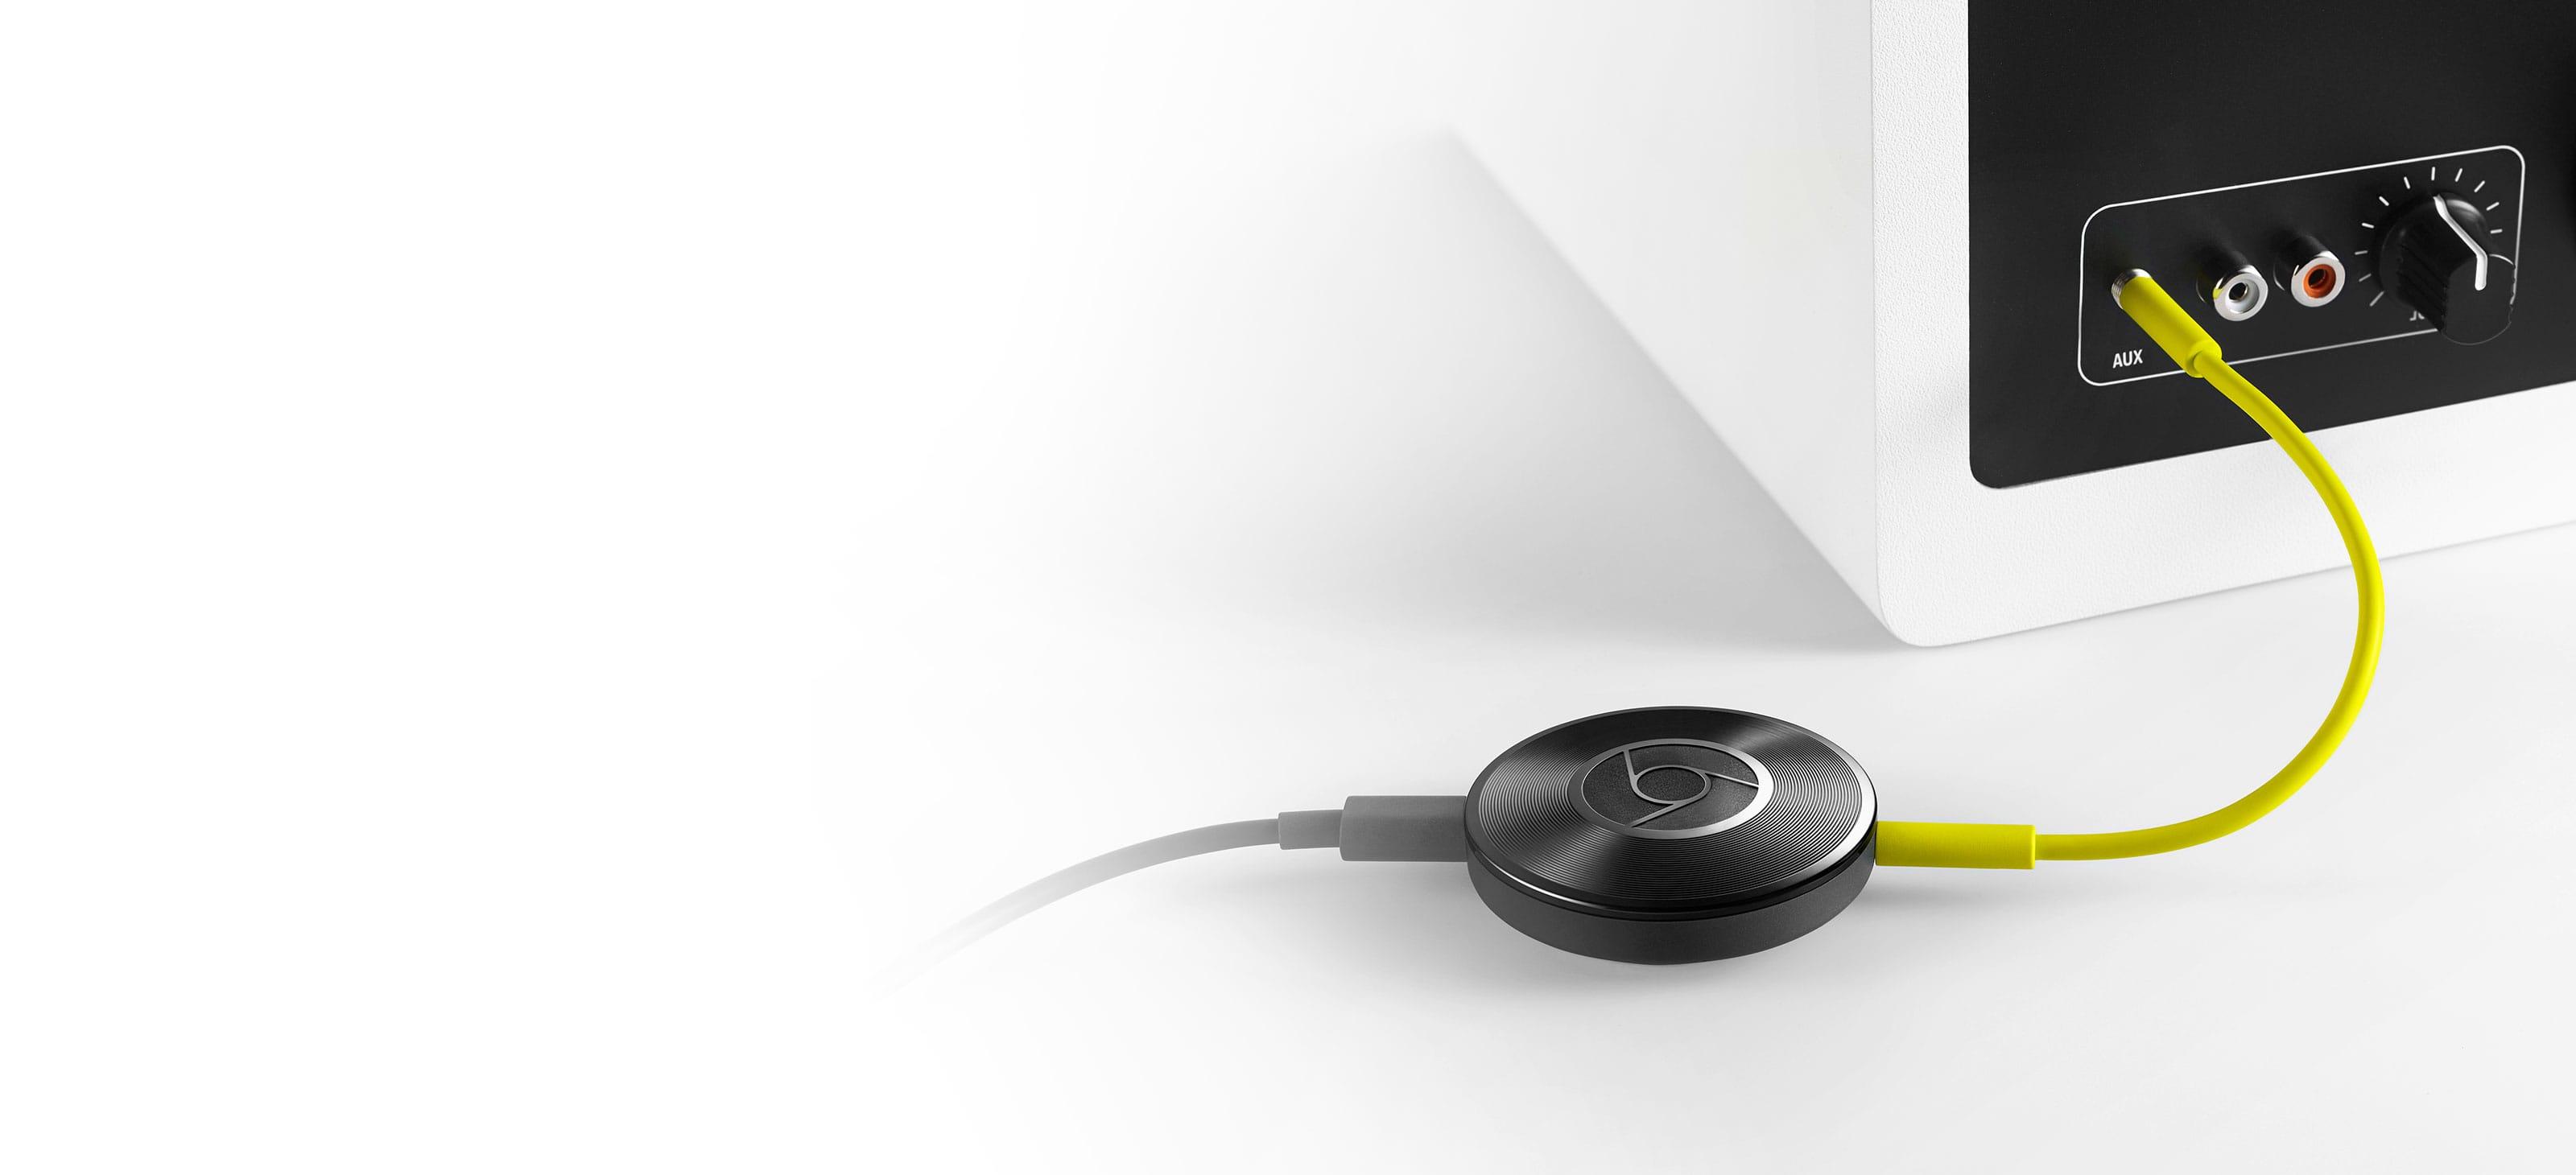 Google Chromecast Audio stop alla vendita